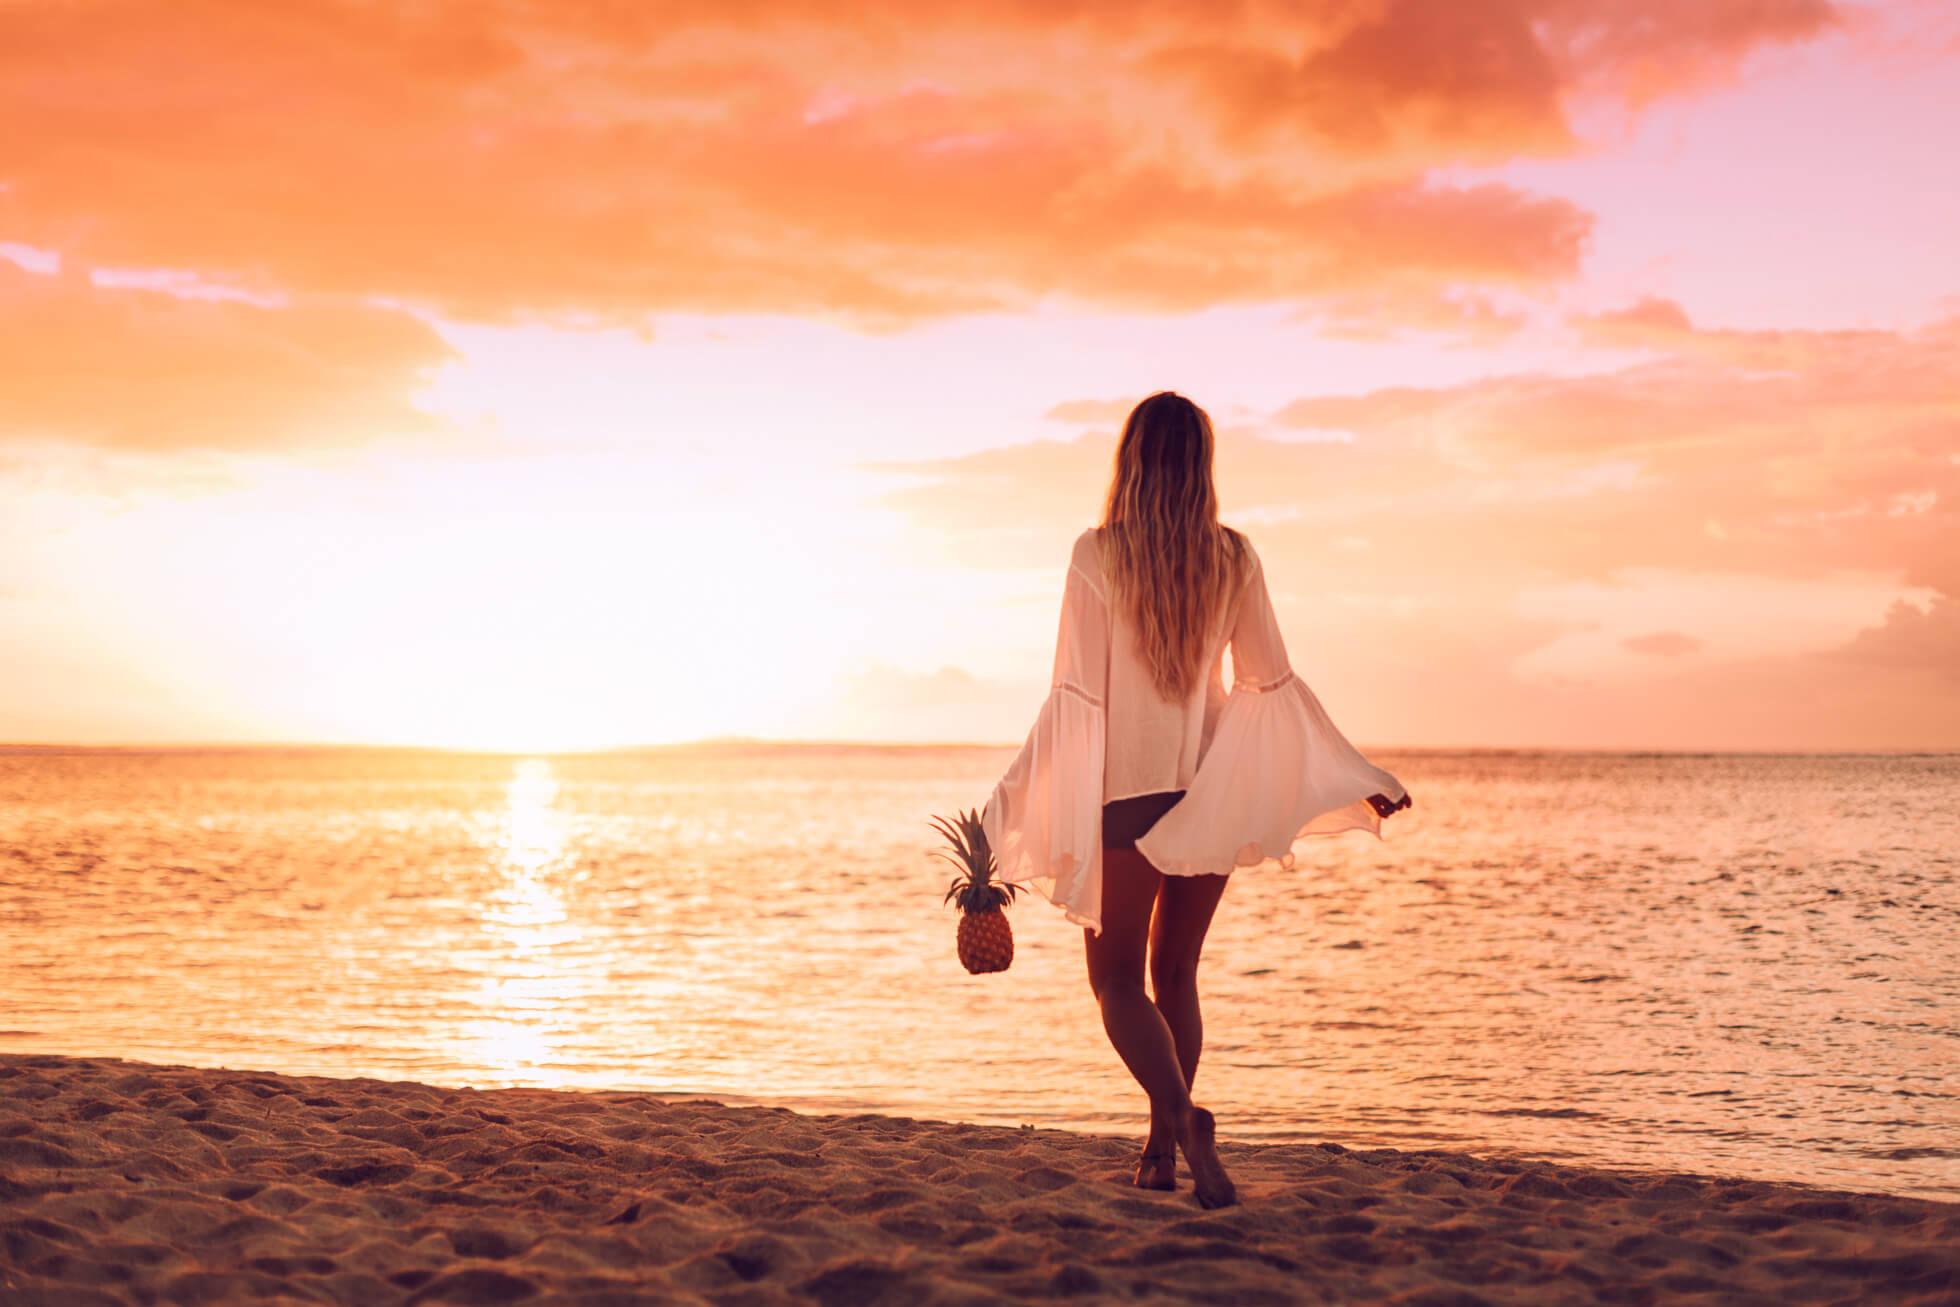 1_MG_8780-Edit - Mauritius sunset by Fabian Wester_